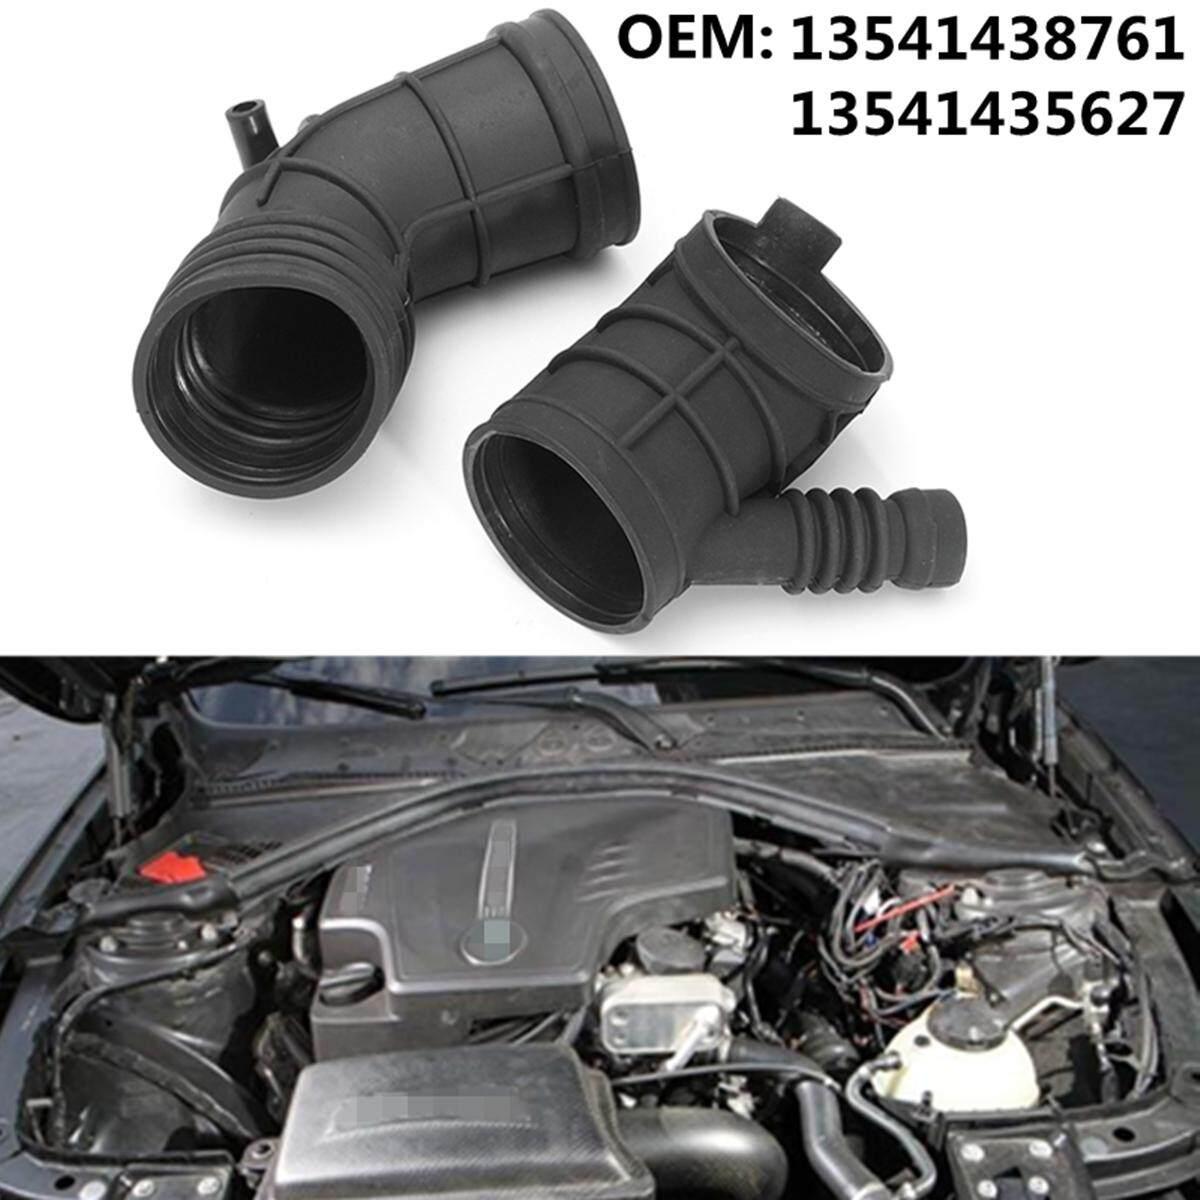 Untuk Bmw E46 E36 Z3 M56 330xi 330i 330ci 325i 325ci Asupan Mesin Perangkat Sepatu Bot Hitam-Intl By Audew.